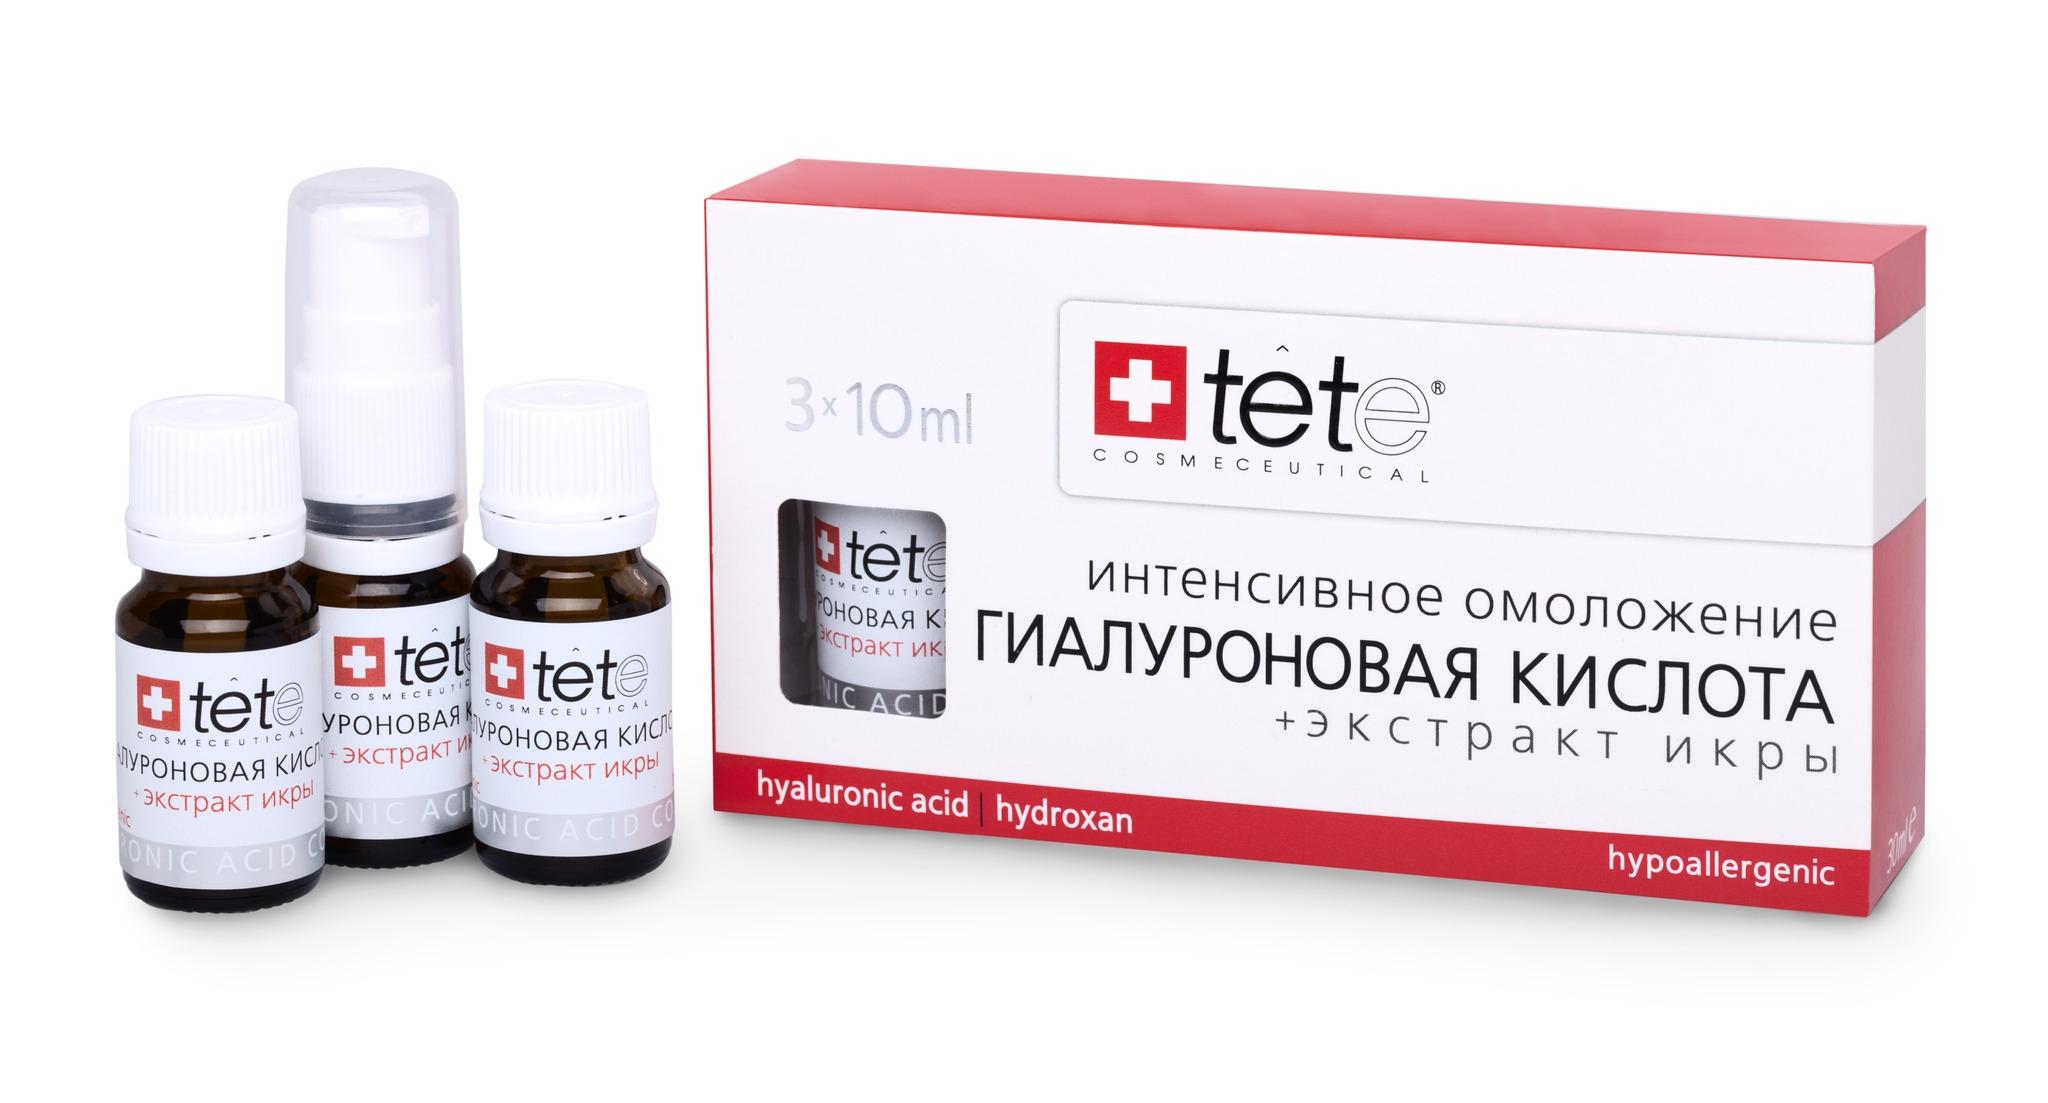 TETe Cosmeceutical Гиалуроновая кислота + экстракт икры, 30 мл косметика кристина гиалуроновая кислота